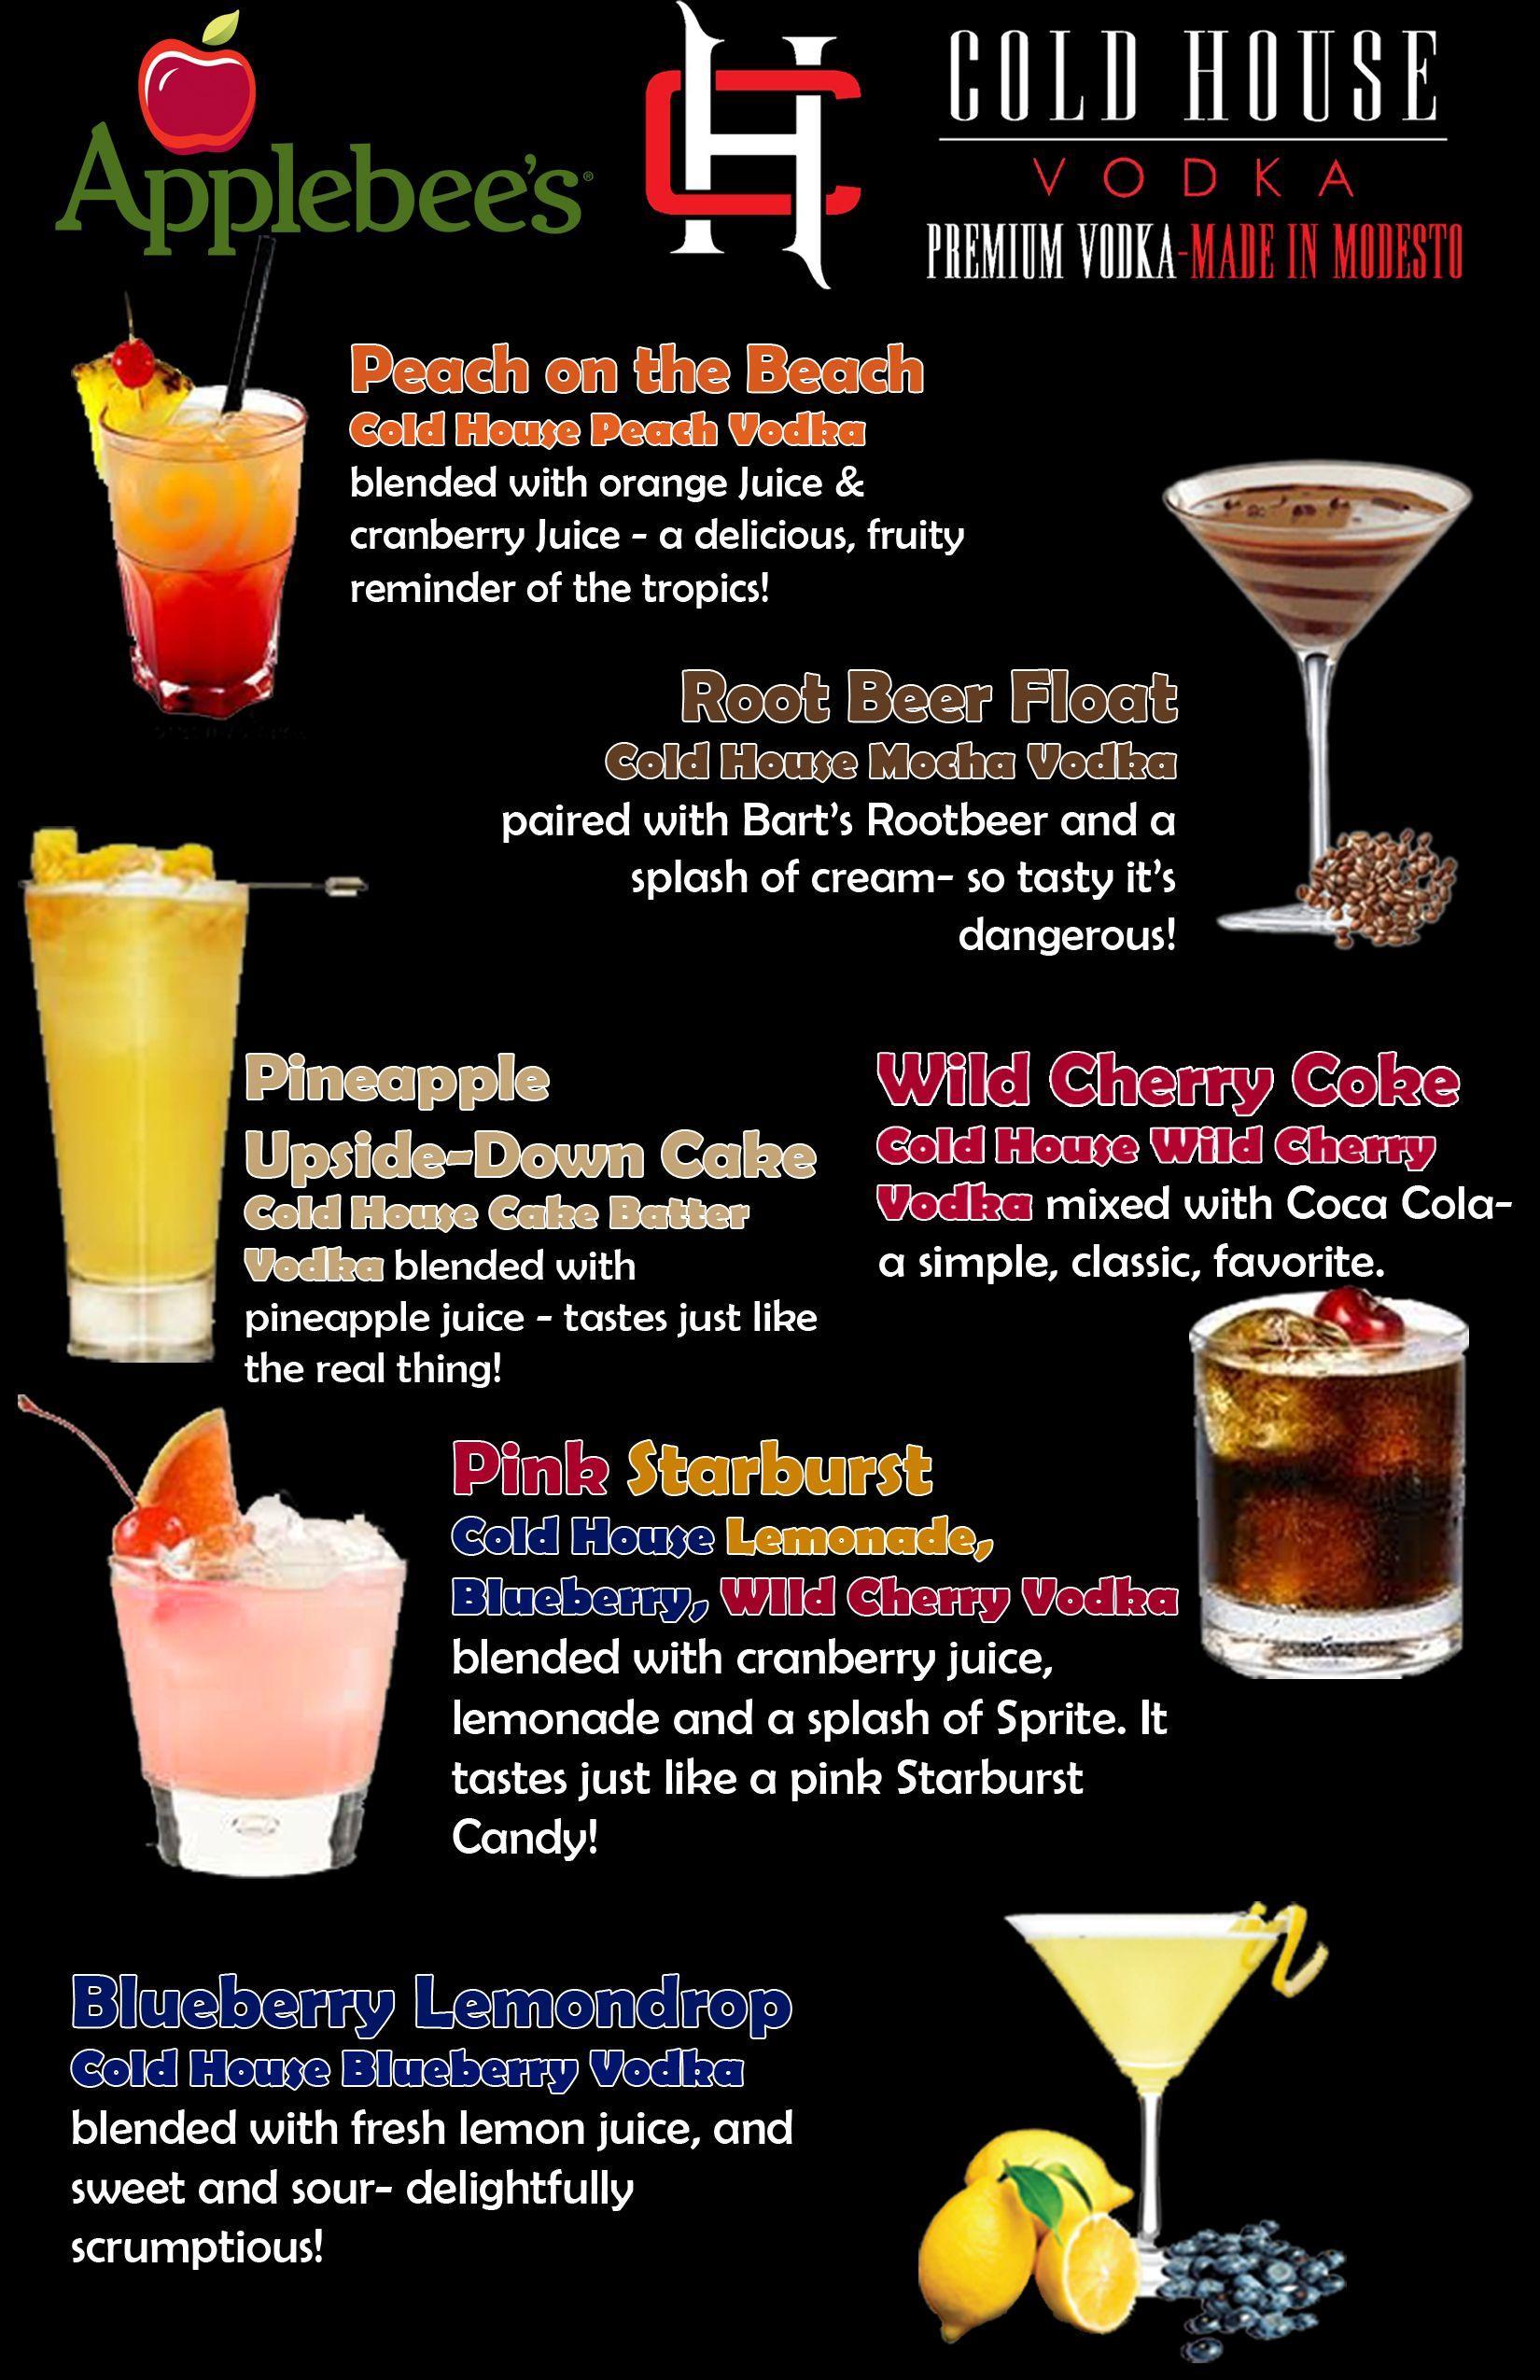 applebee's custom menu | vodka recipes in 2018 | pinterest | drinks